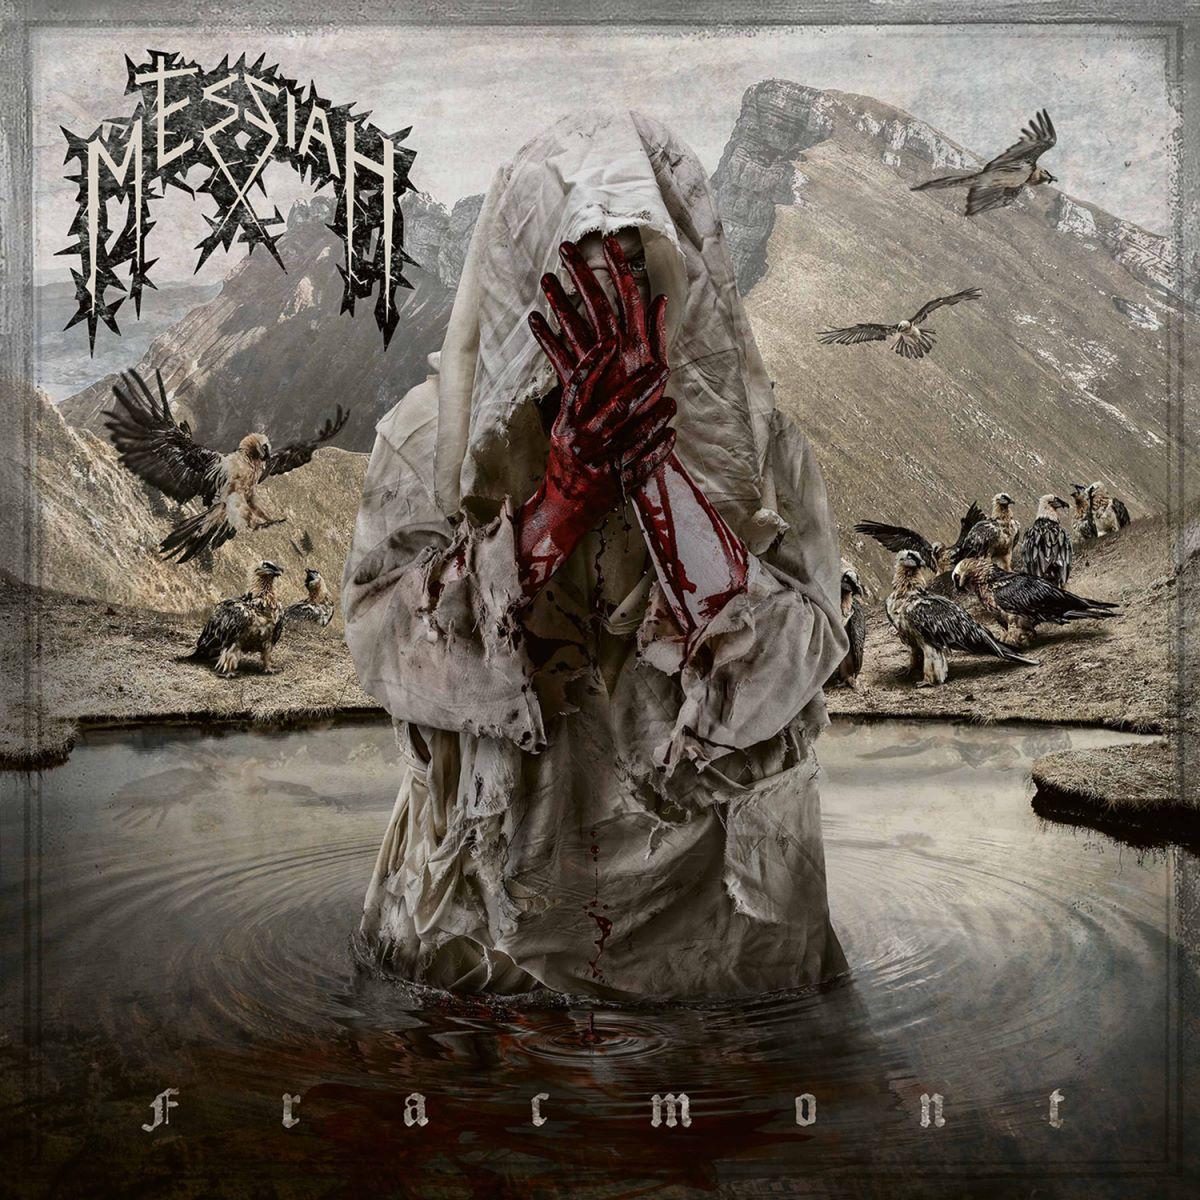 Messiah - Fracmont - album cover